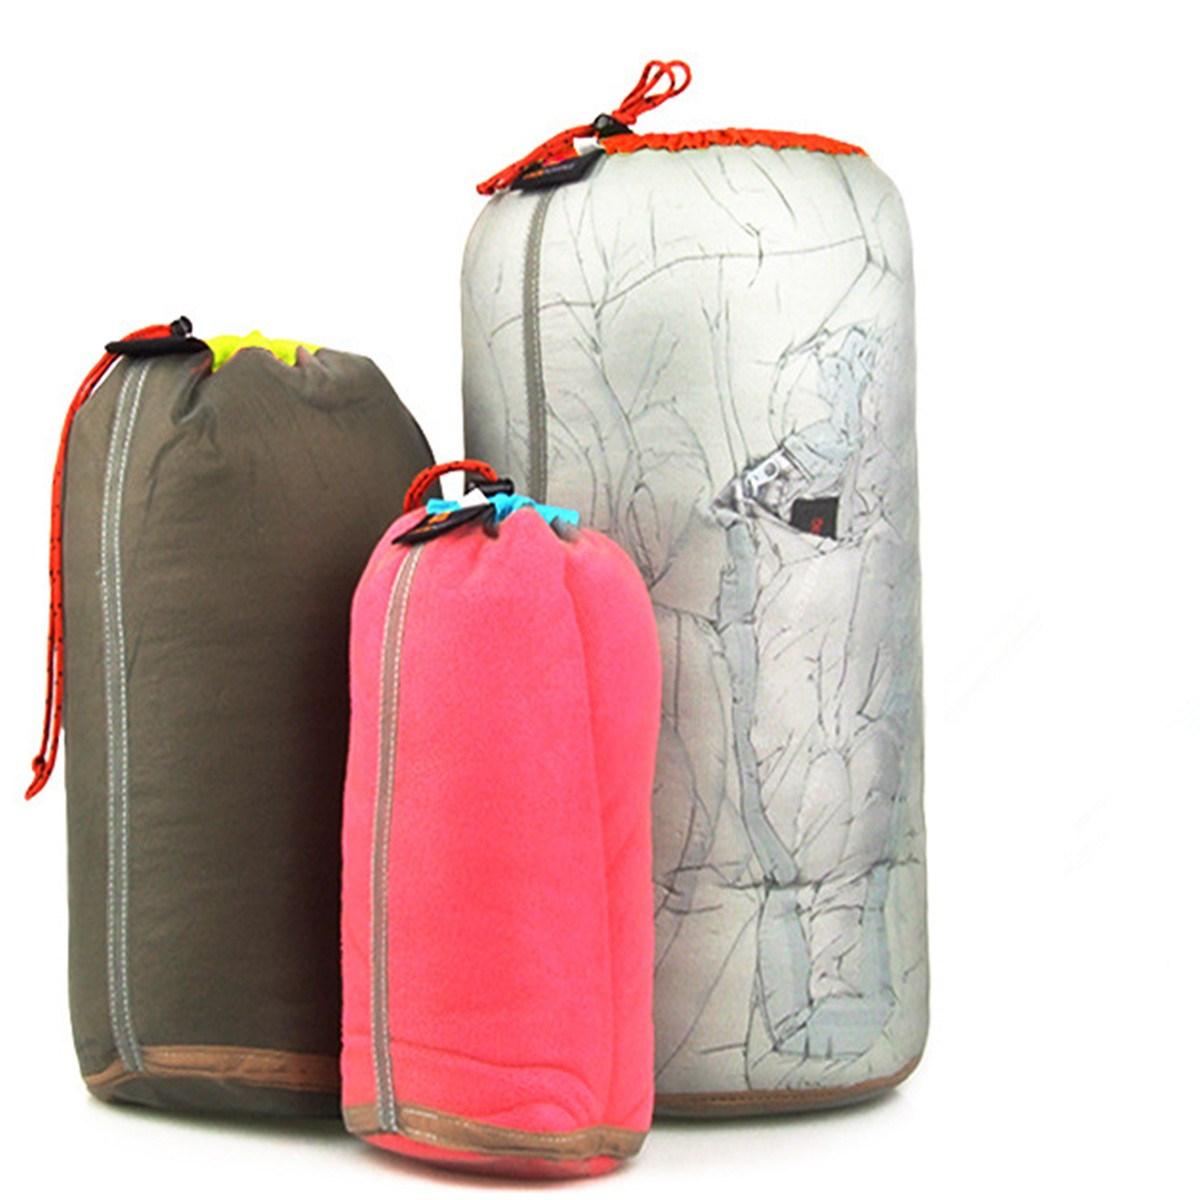 Ultralight Portable Drawstring mesh Stuff Sack Storage Bag for outdoor Sports Traveling Camping hiking S M L XL XXL